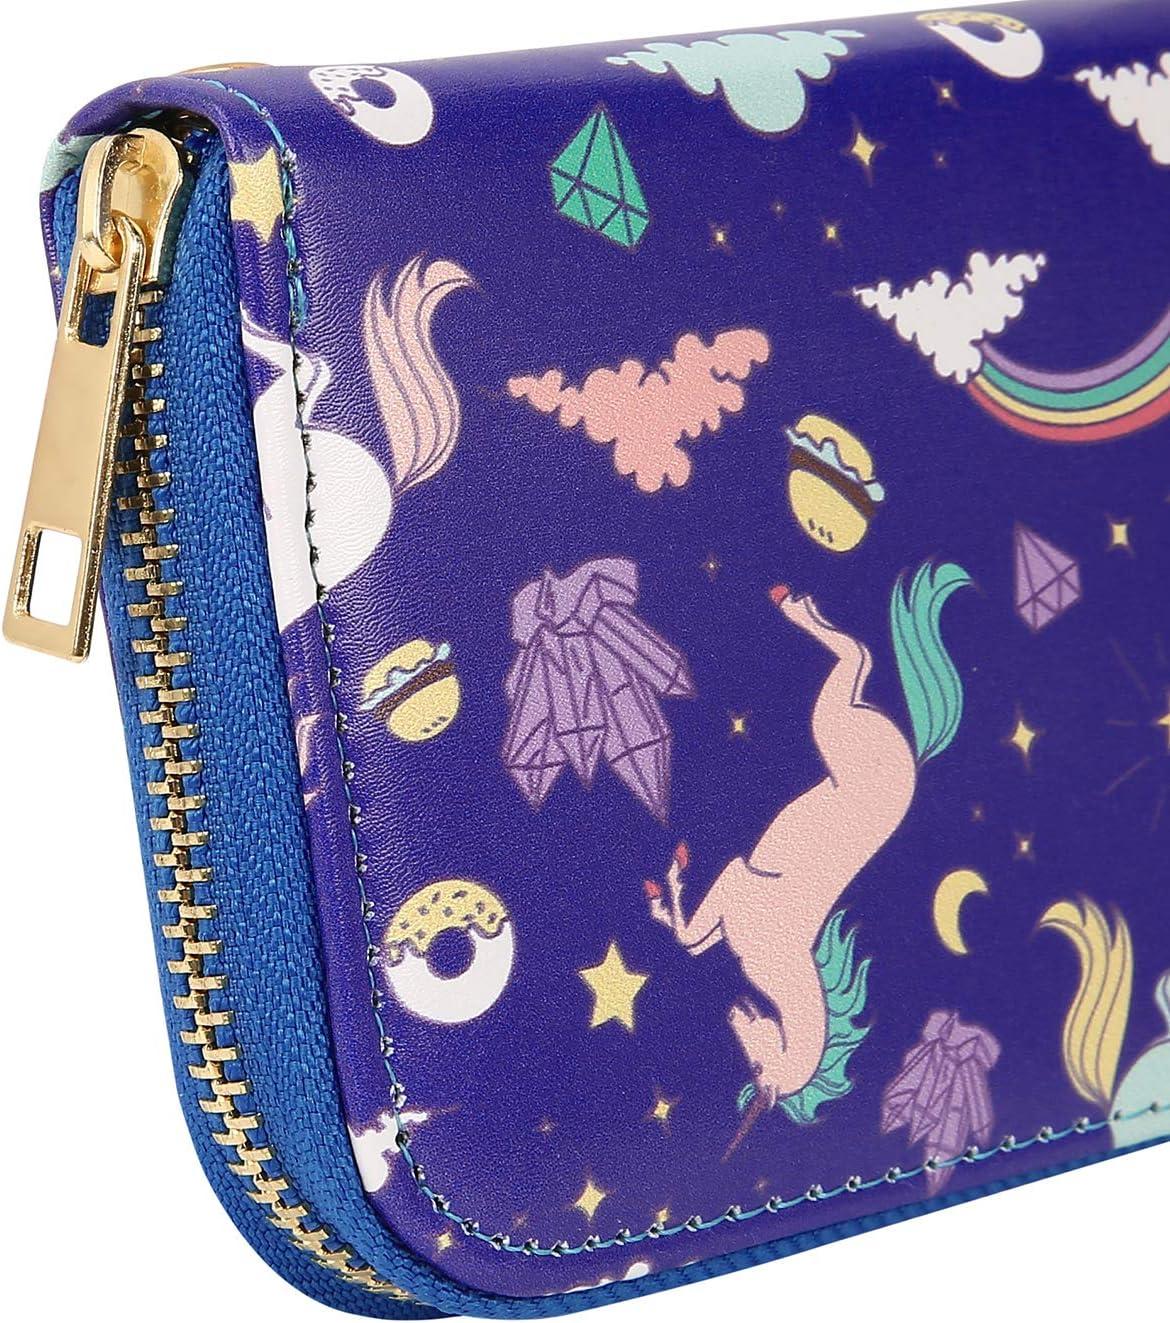 Unicorn HDE Clutch Wallets for Women RFID Blocking Credit Card Holder Zipper Purse